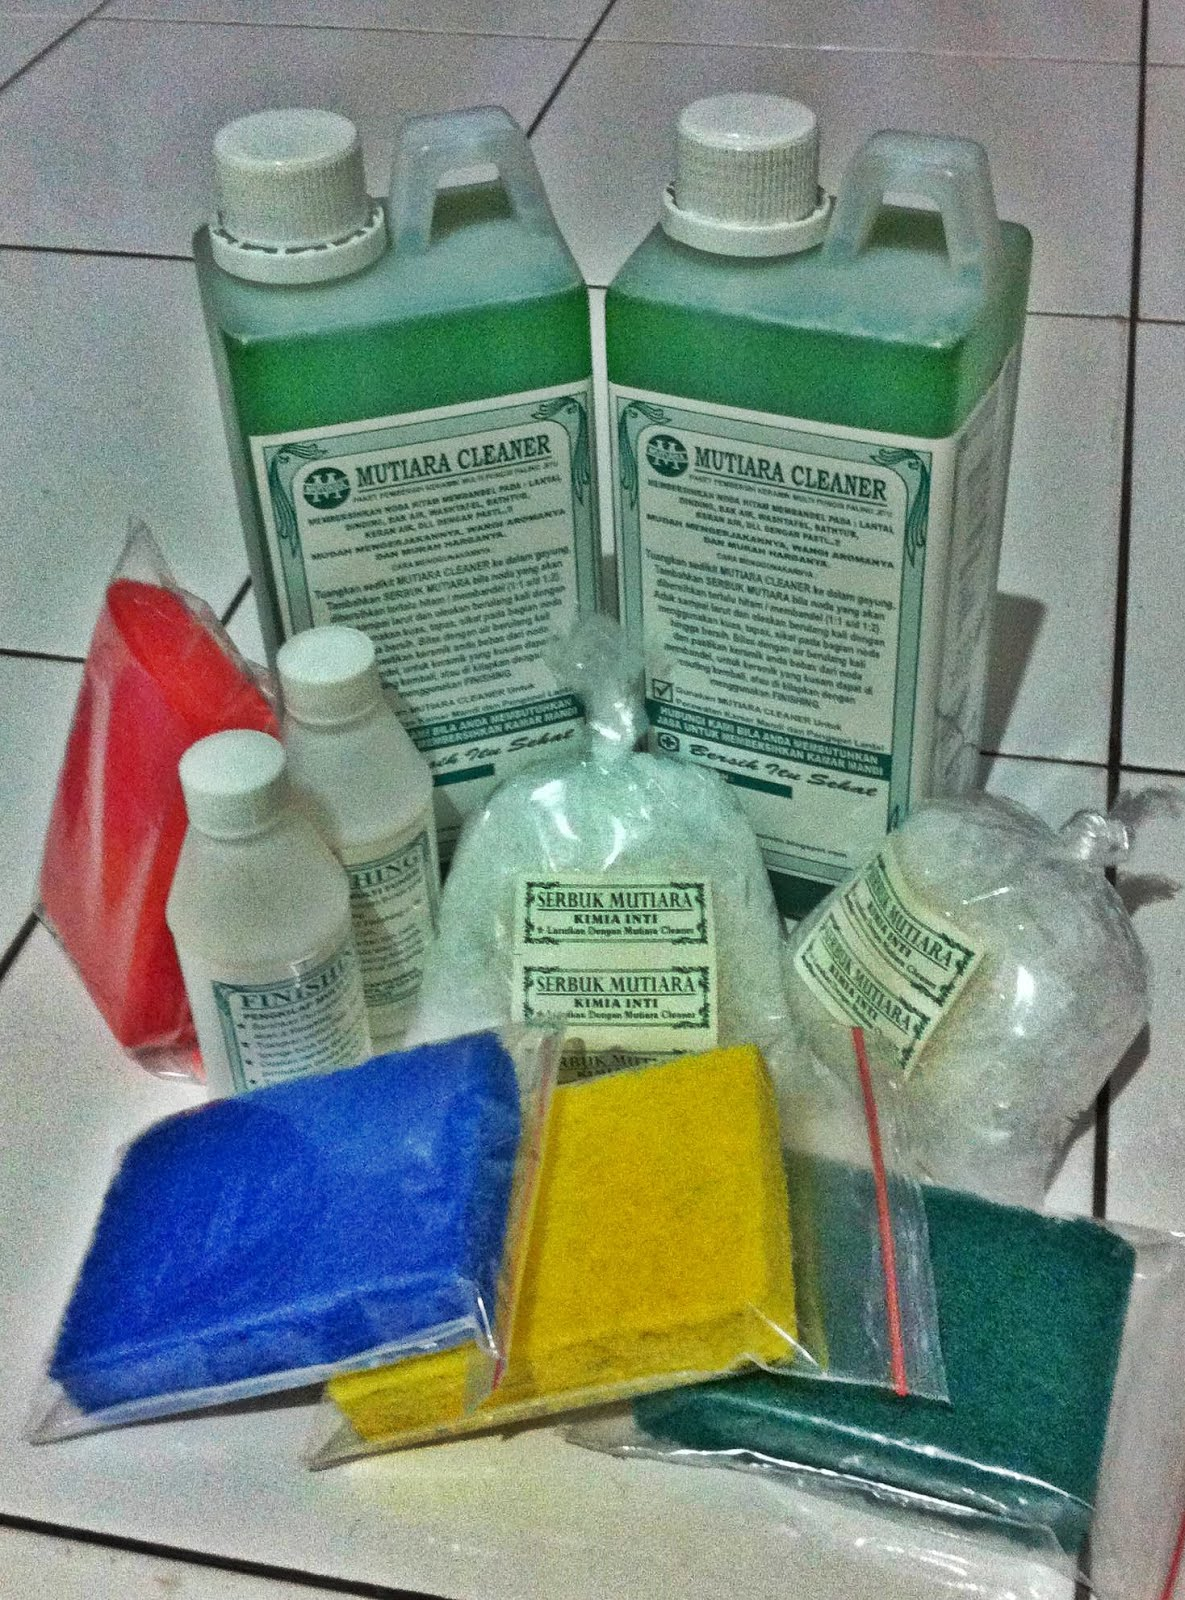 Paket Mutiara Cleaner